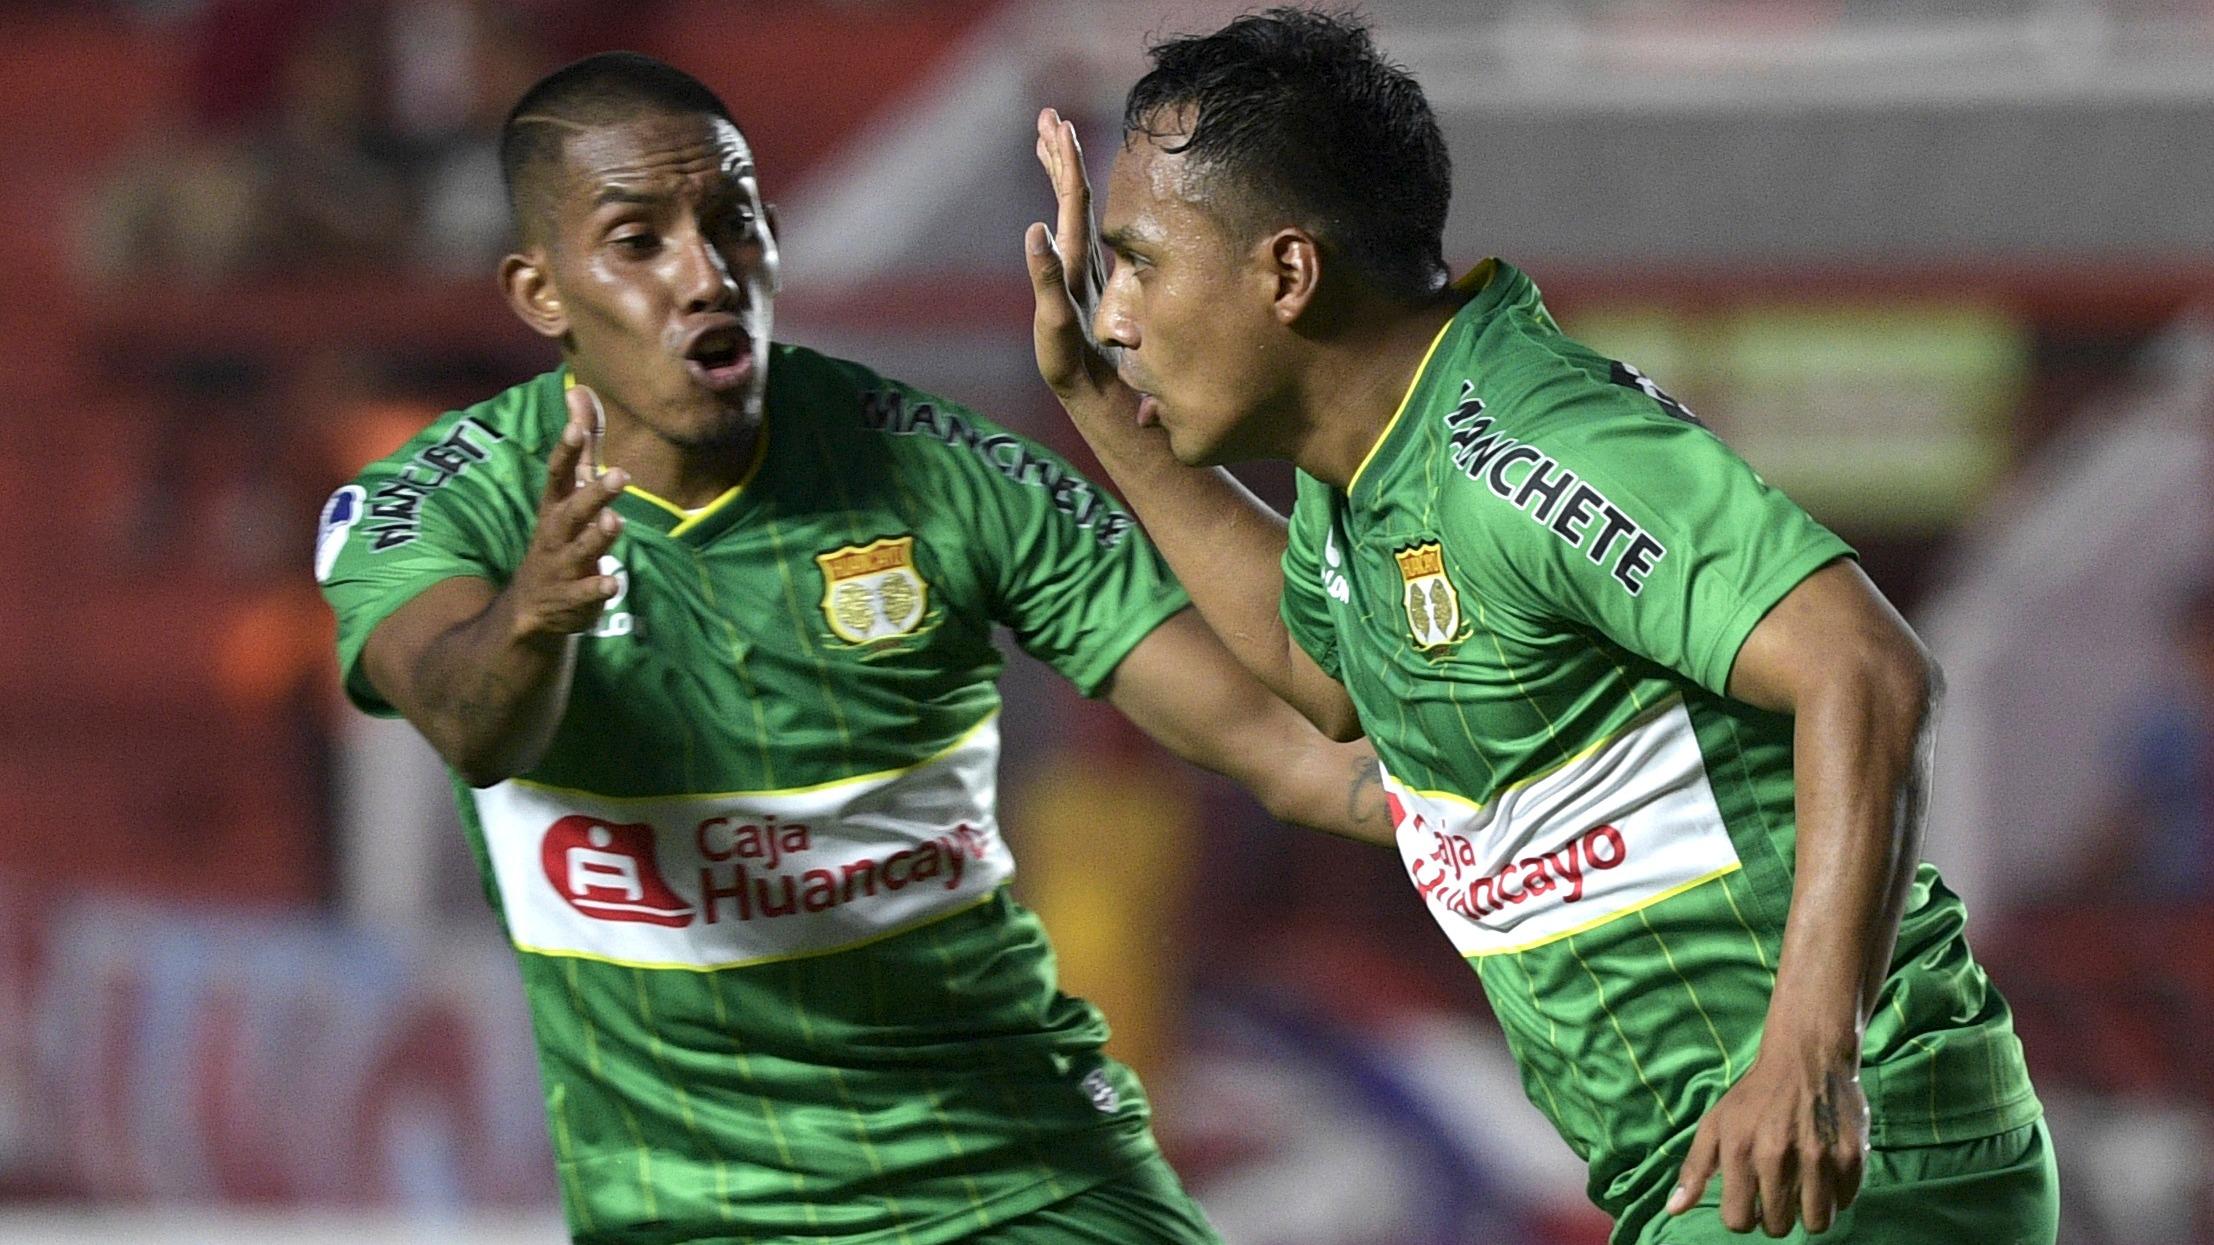 Marcos Lliuya anotó el gol de Sport Huancayo